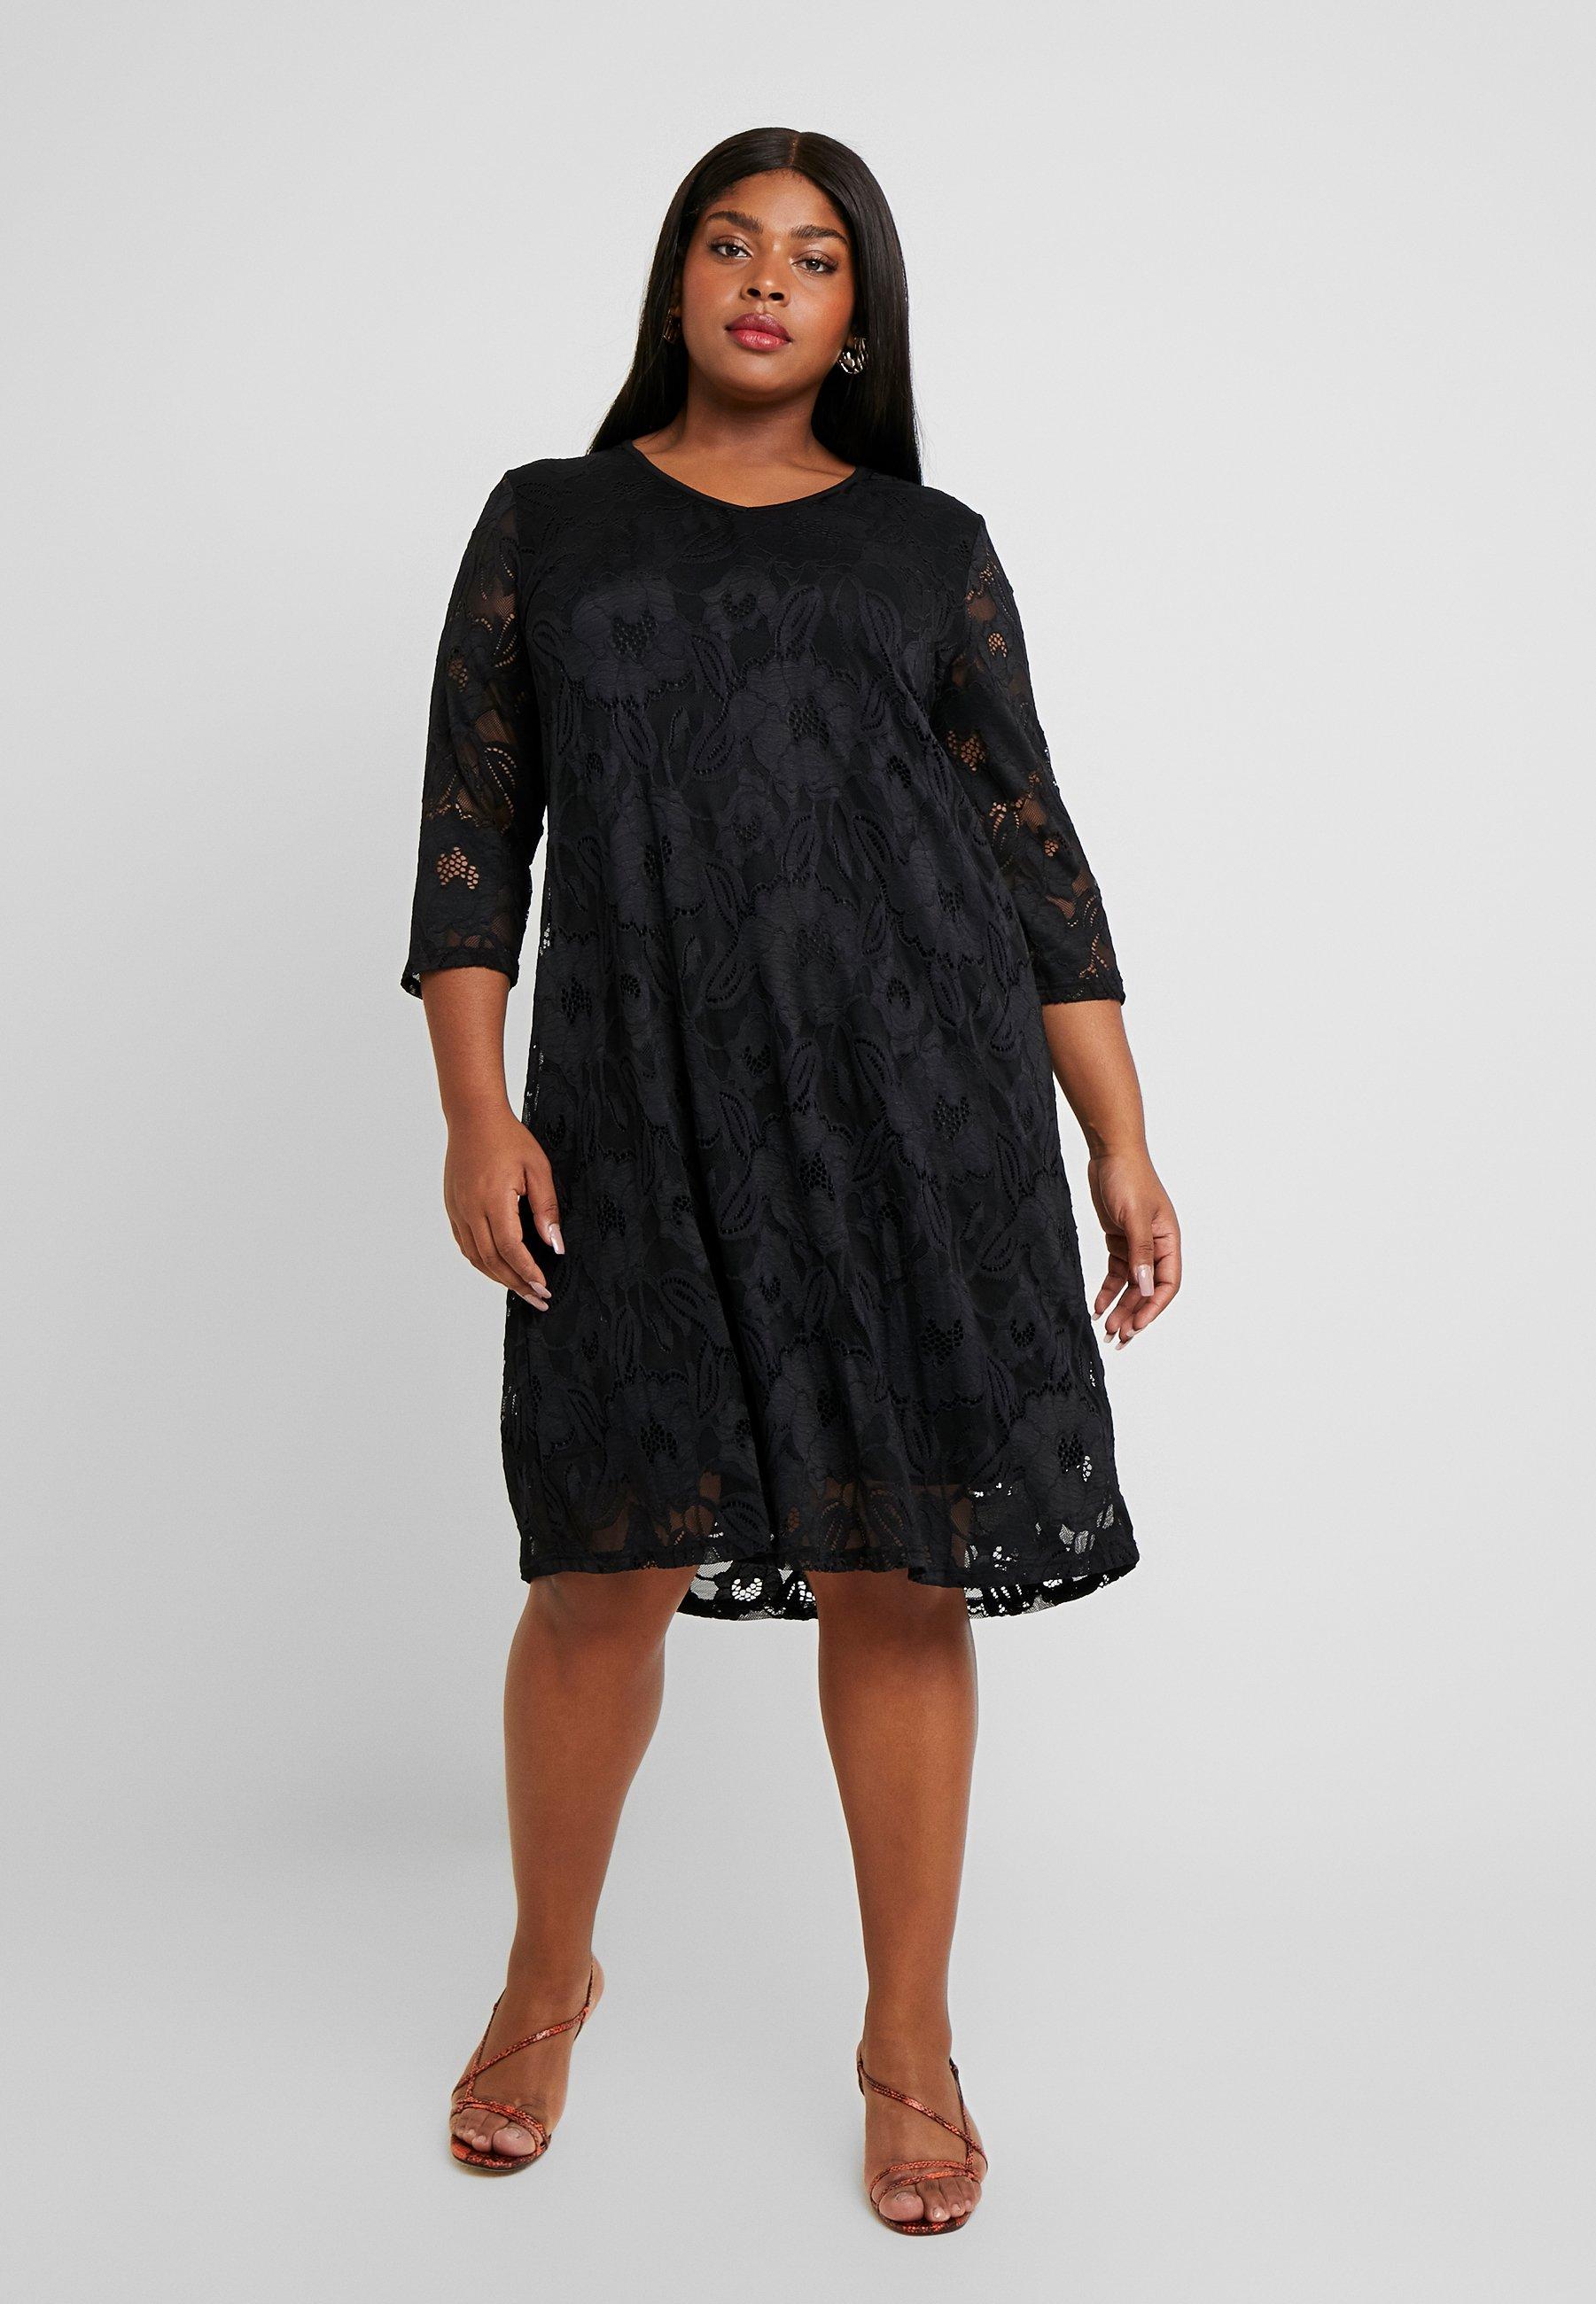 Ciso Outlet dameskleding • ZALANDO • Ontdek het hier!